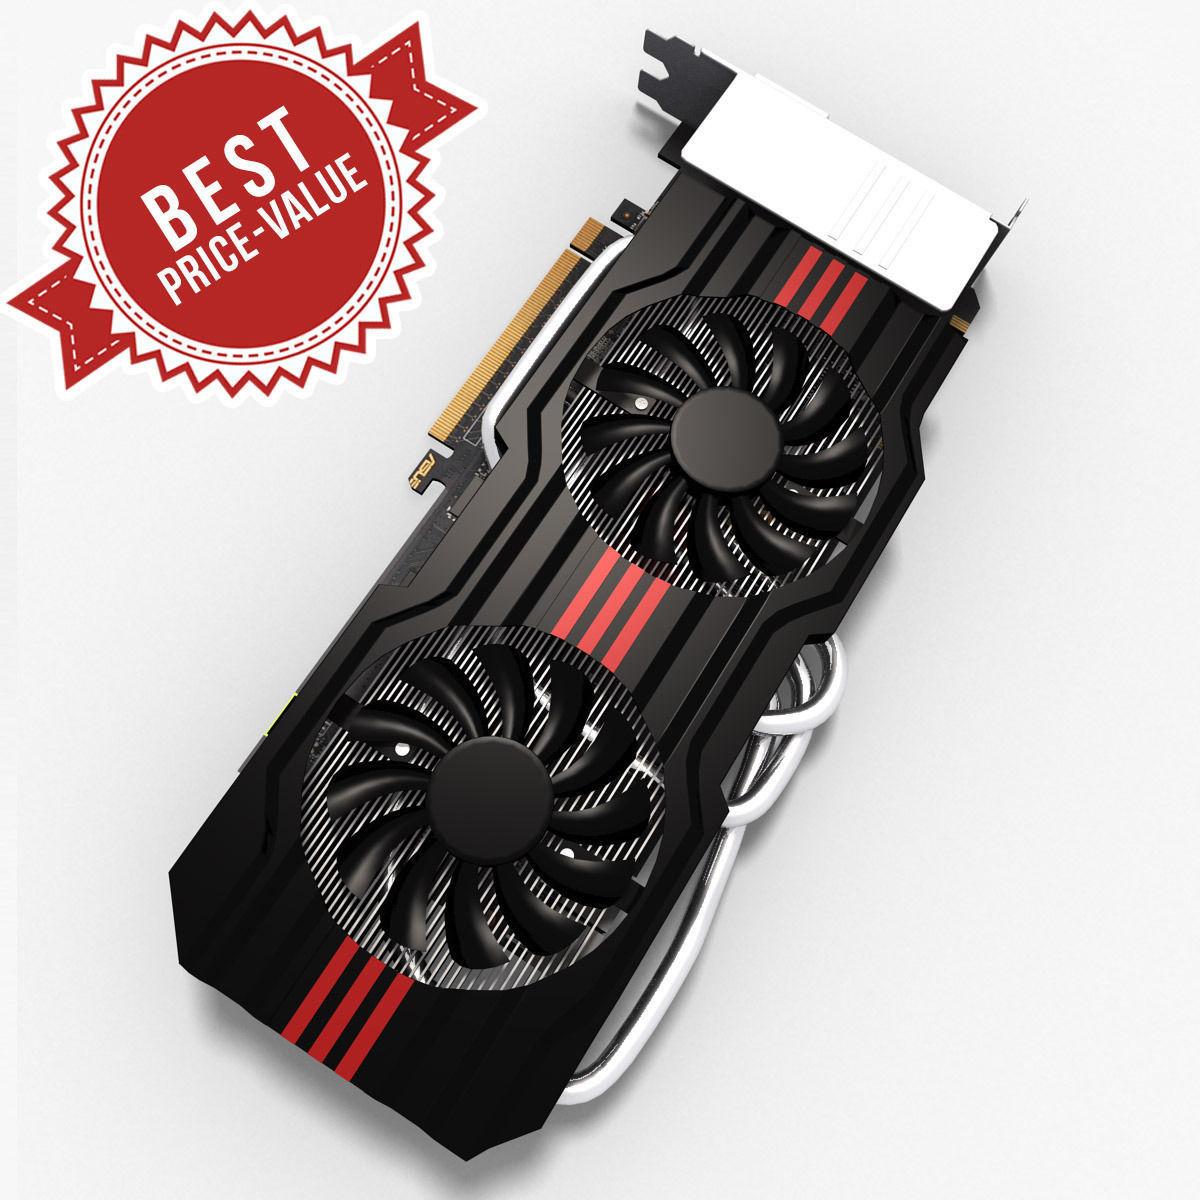 Graphic card Nvidia Geforce GTX 660 ti